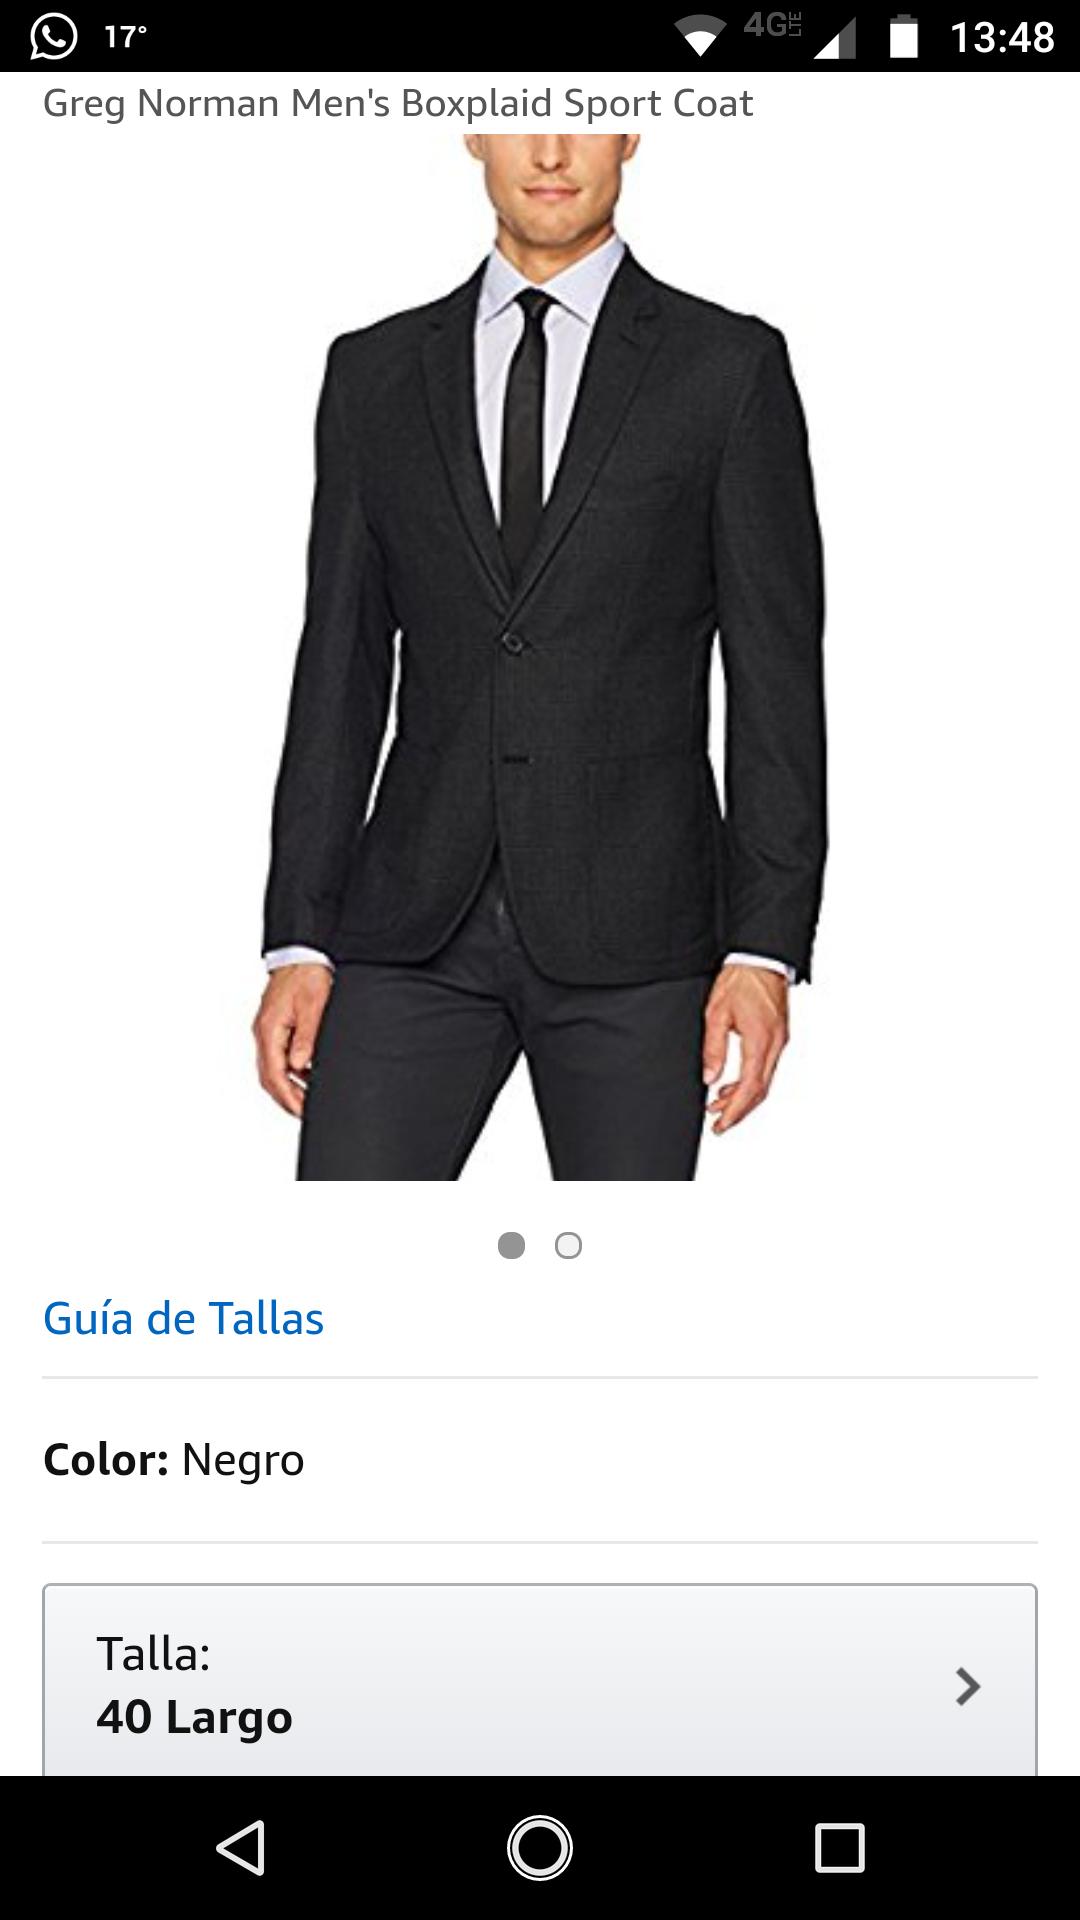 Amazon: saco deportivo Greg Norman a excelente precio incluye Amazon prime